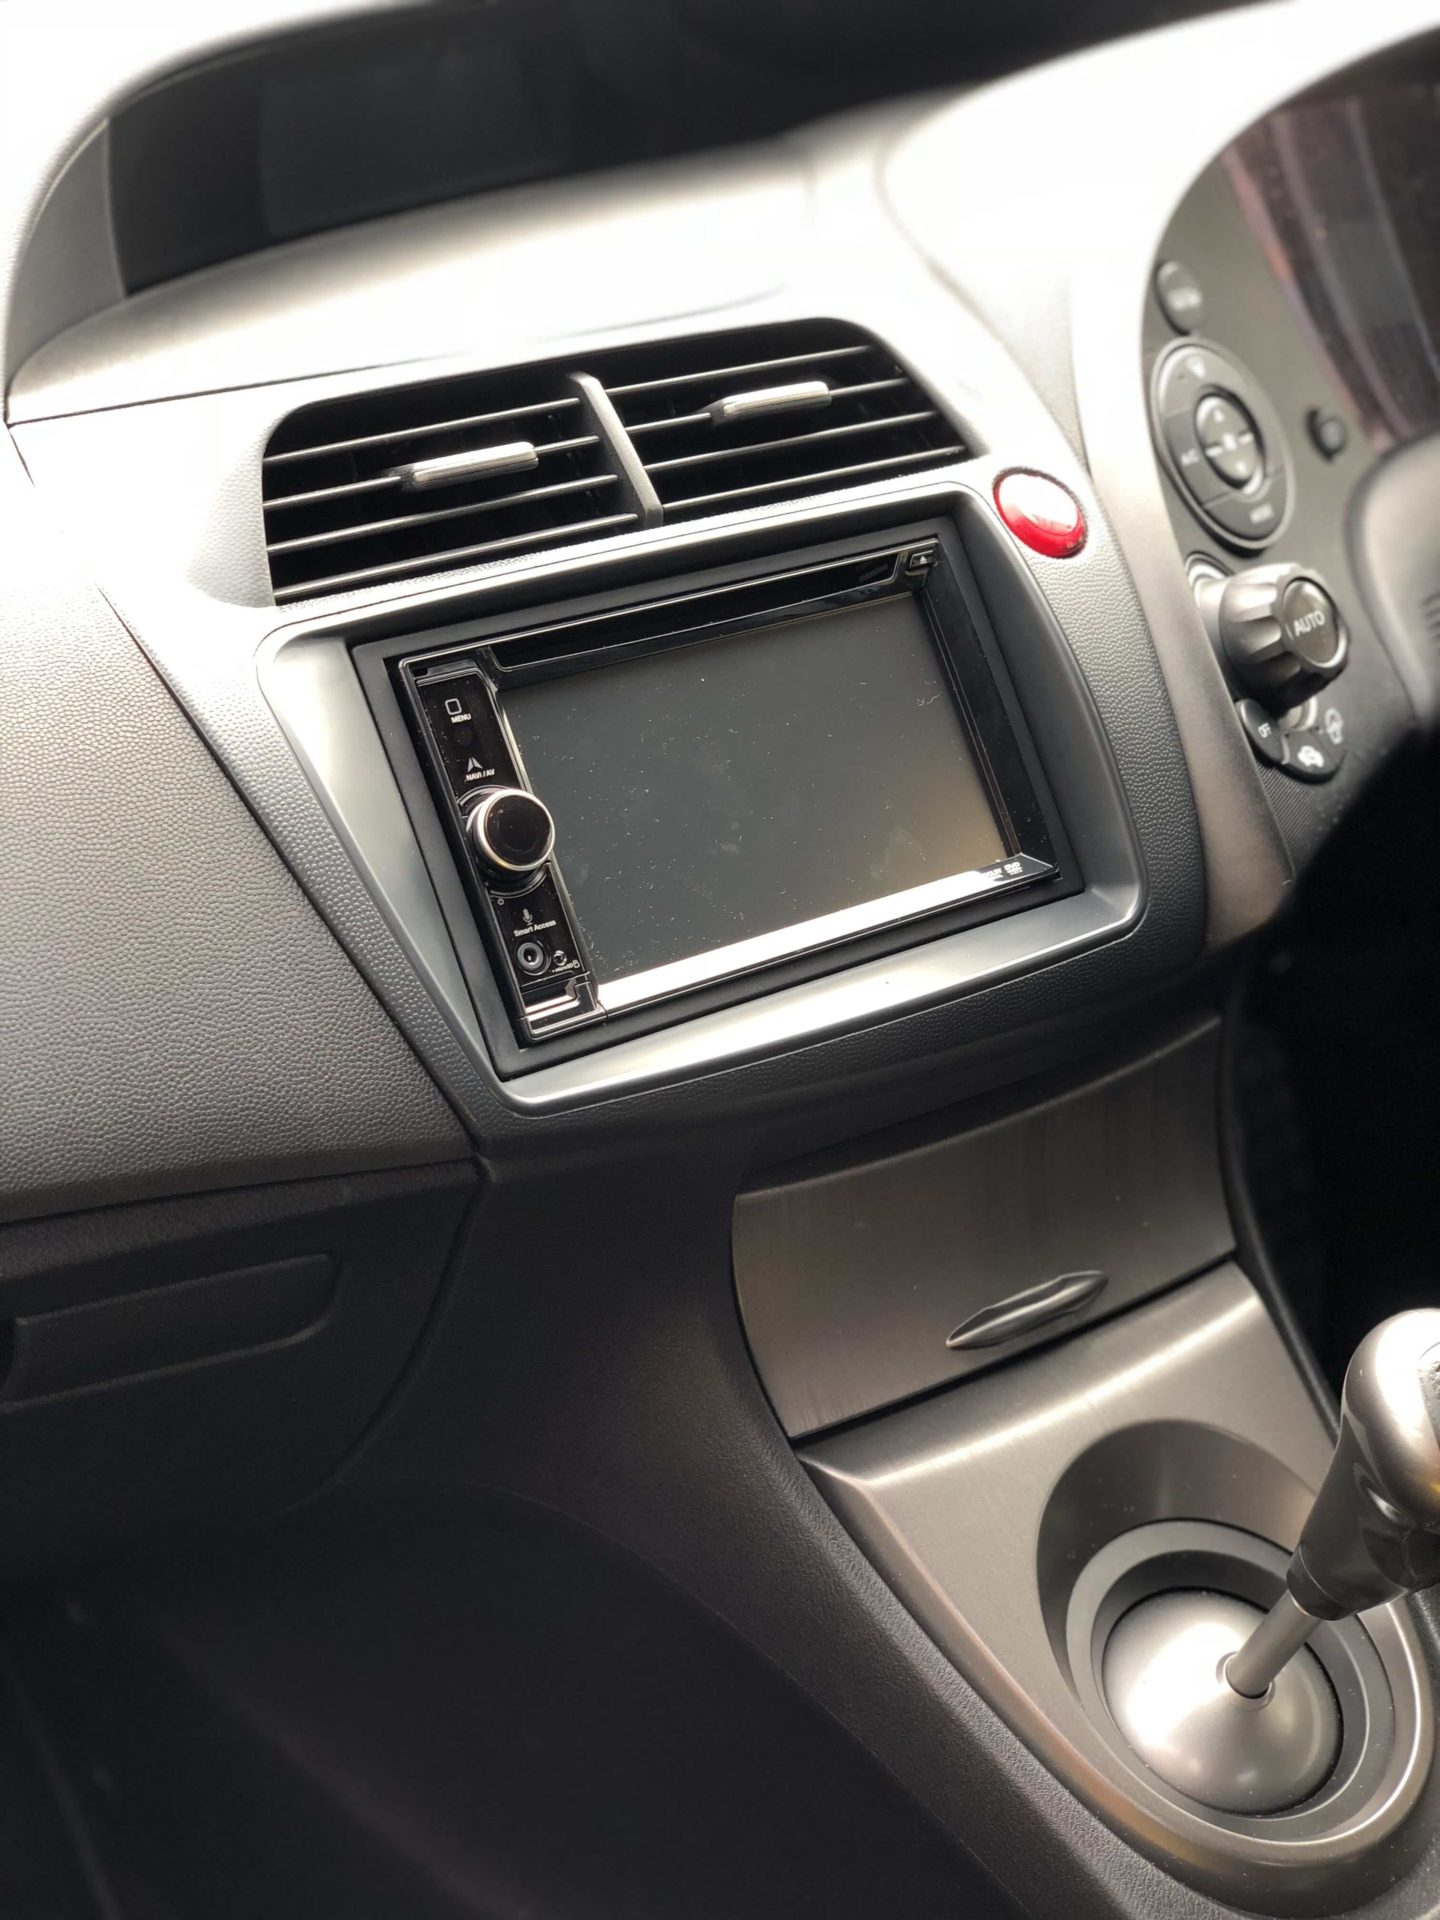 Clarion SatNav unit in Honda Civic 2011-min